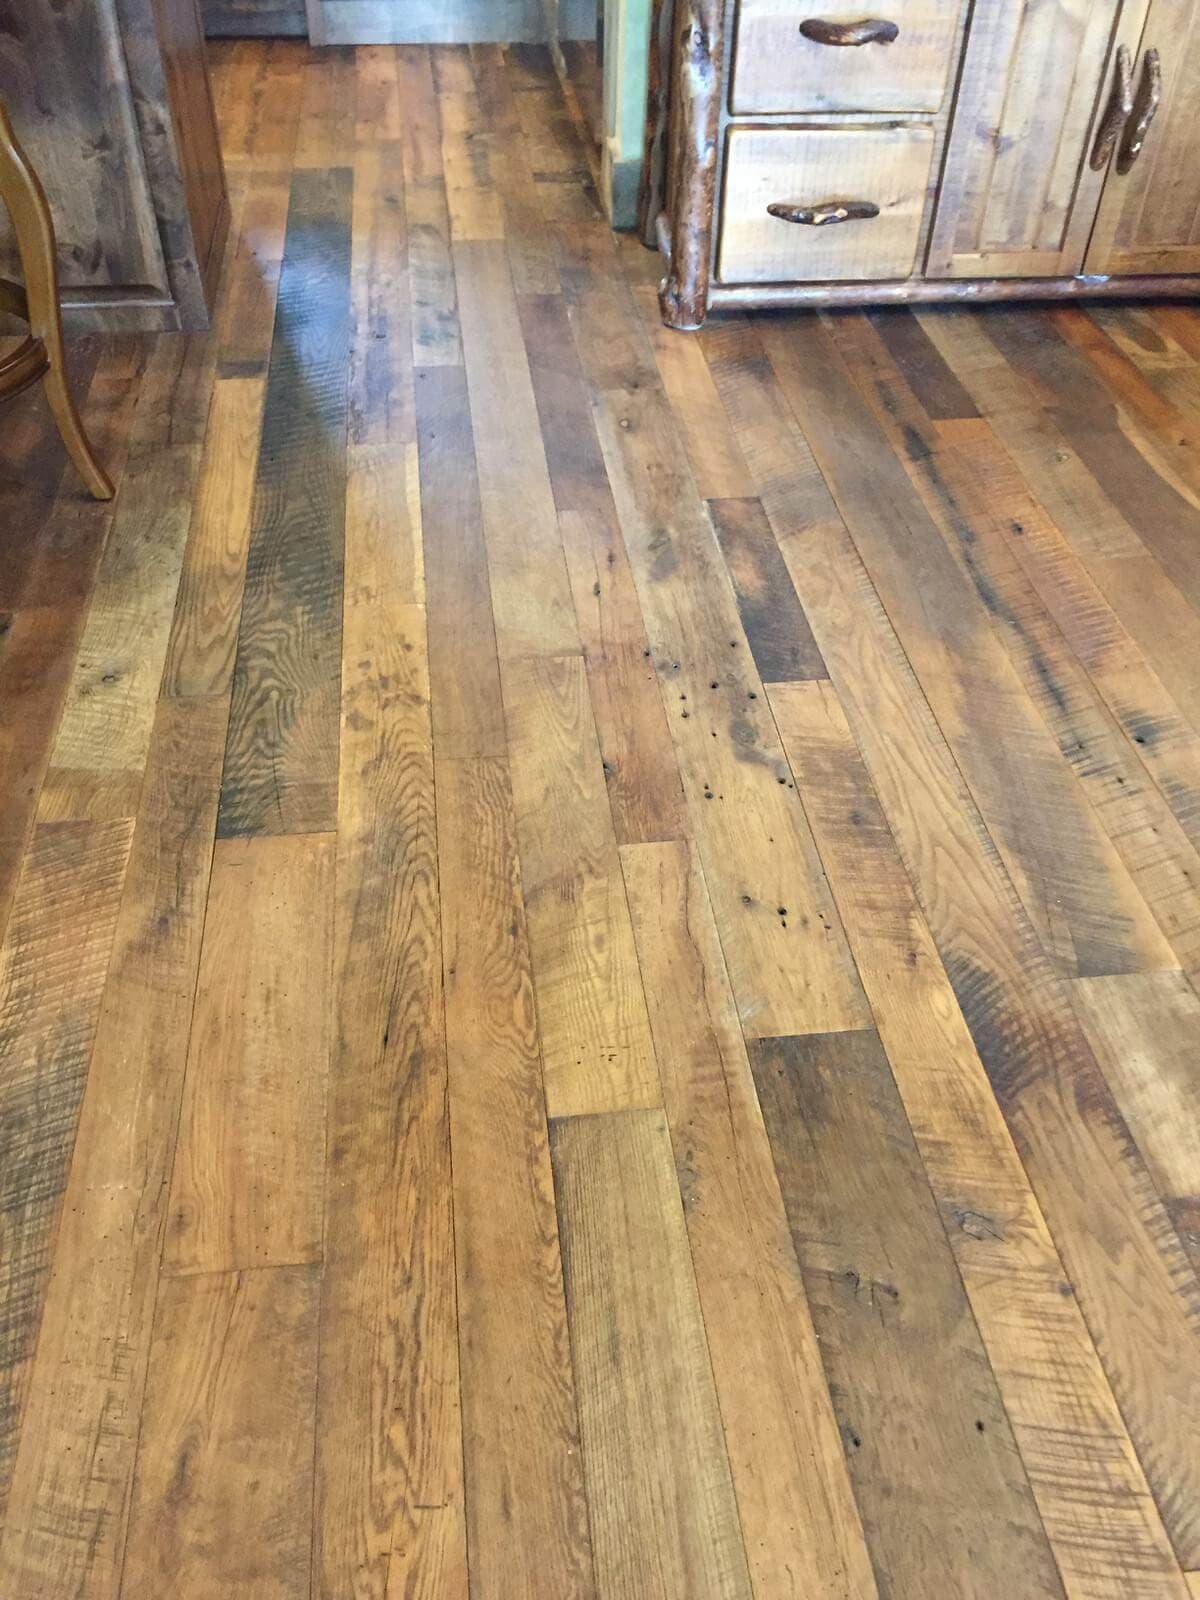 Mtn falls reclaimed hardwoods flooring lake toxaway nc